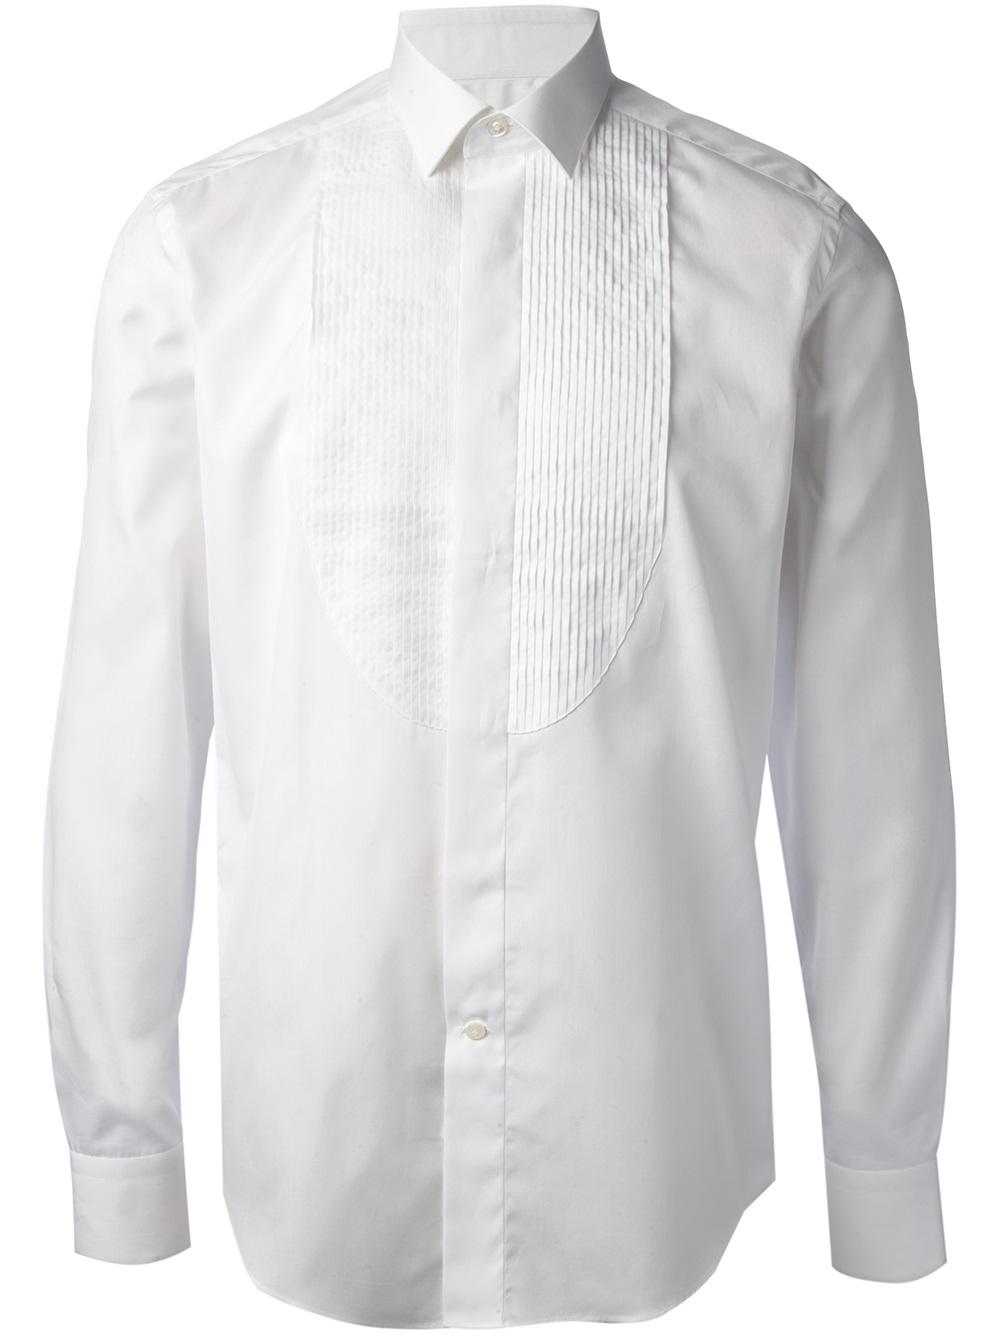 Lanvin Classic Dress Shirt In White For Men Lyst